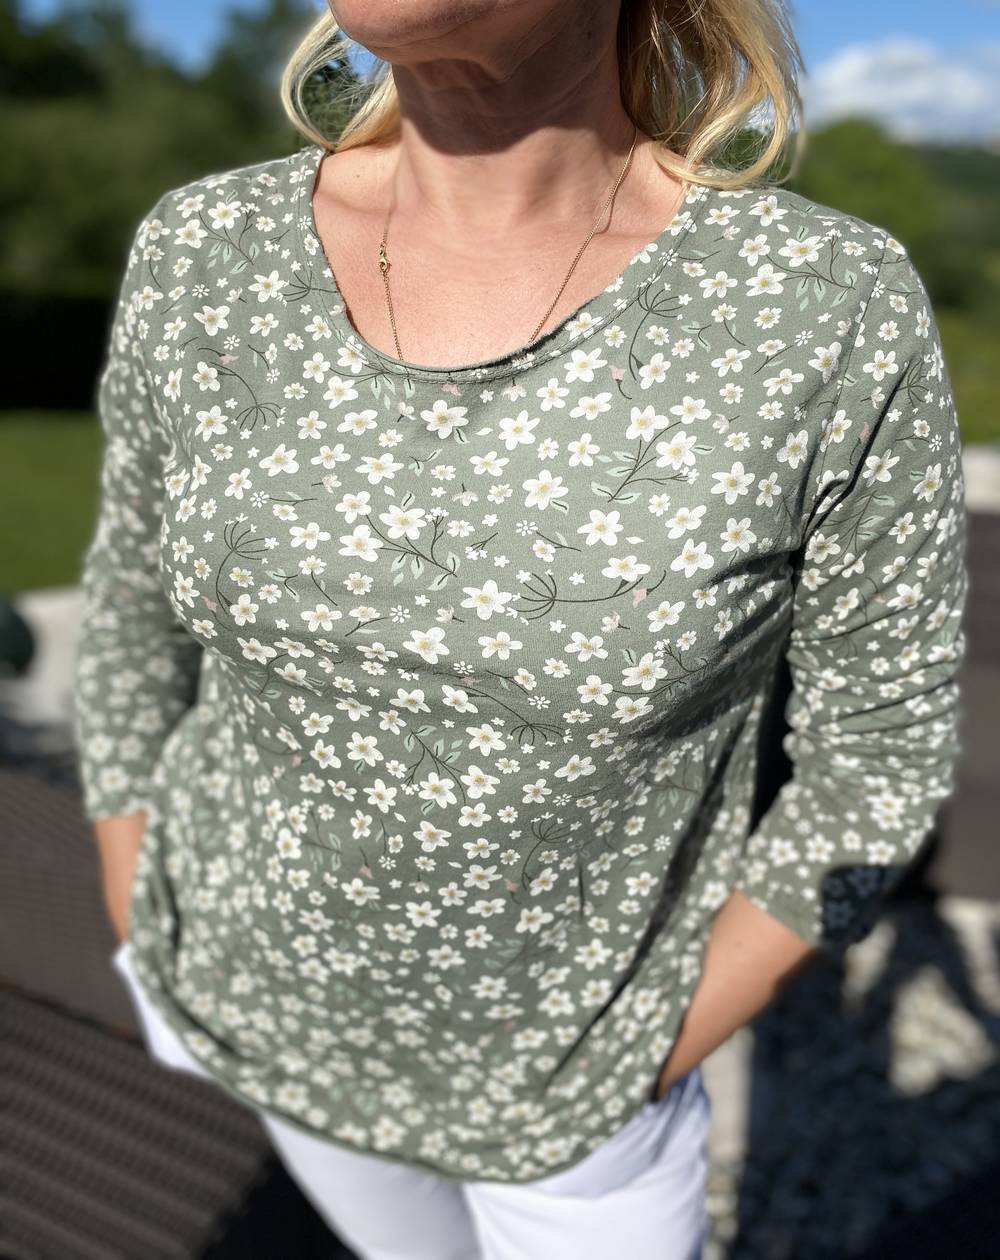 Tee shirt kaki à manches longues et motifs fleuris